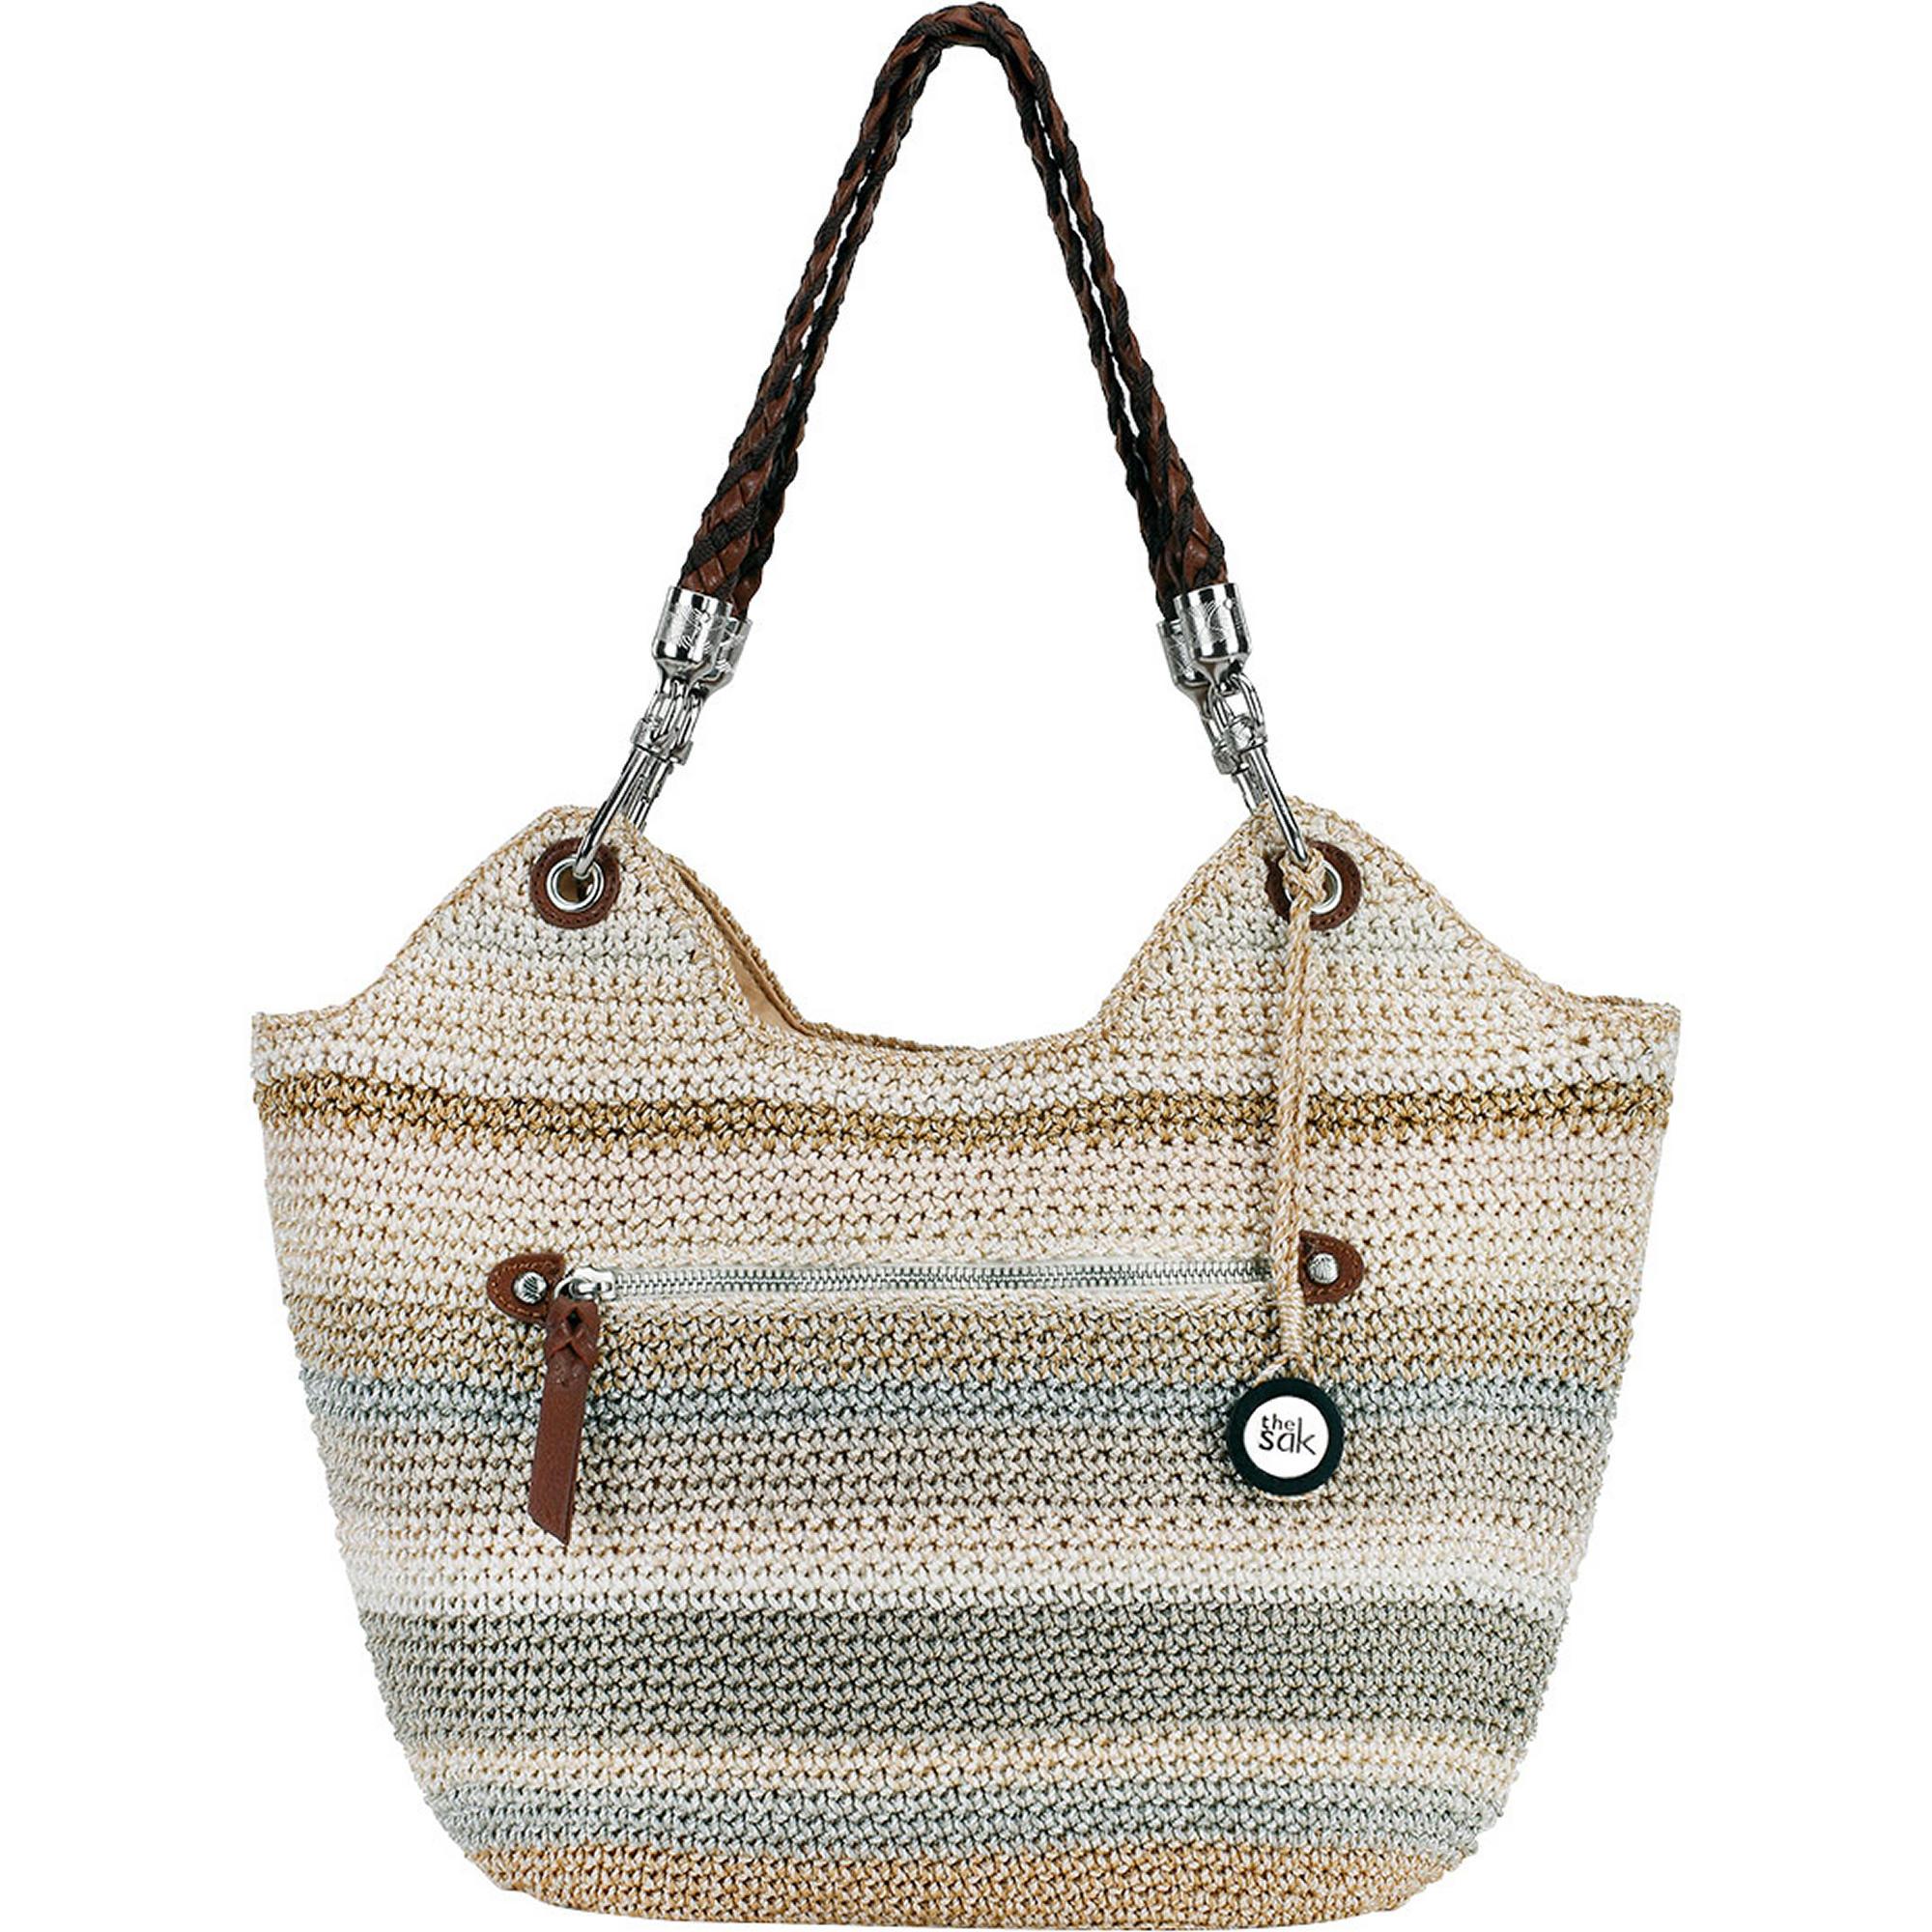 Costco Members: The Sak Indio Satchel (Sand Stripe)  $10 + Free Shipping